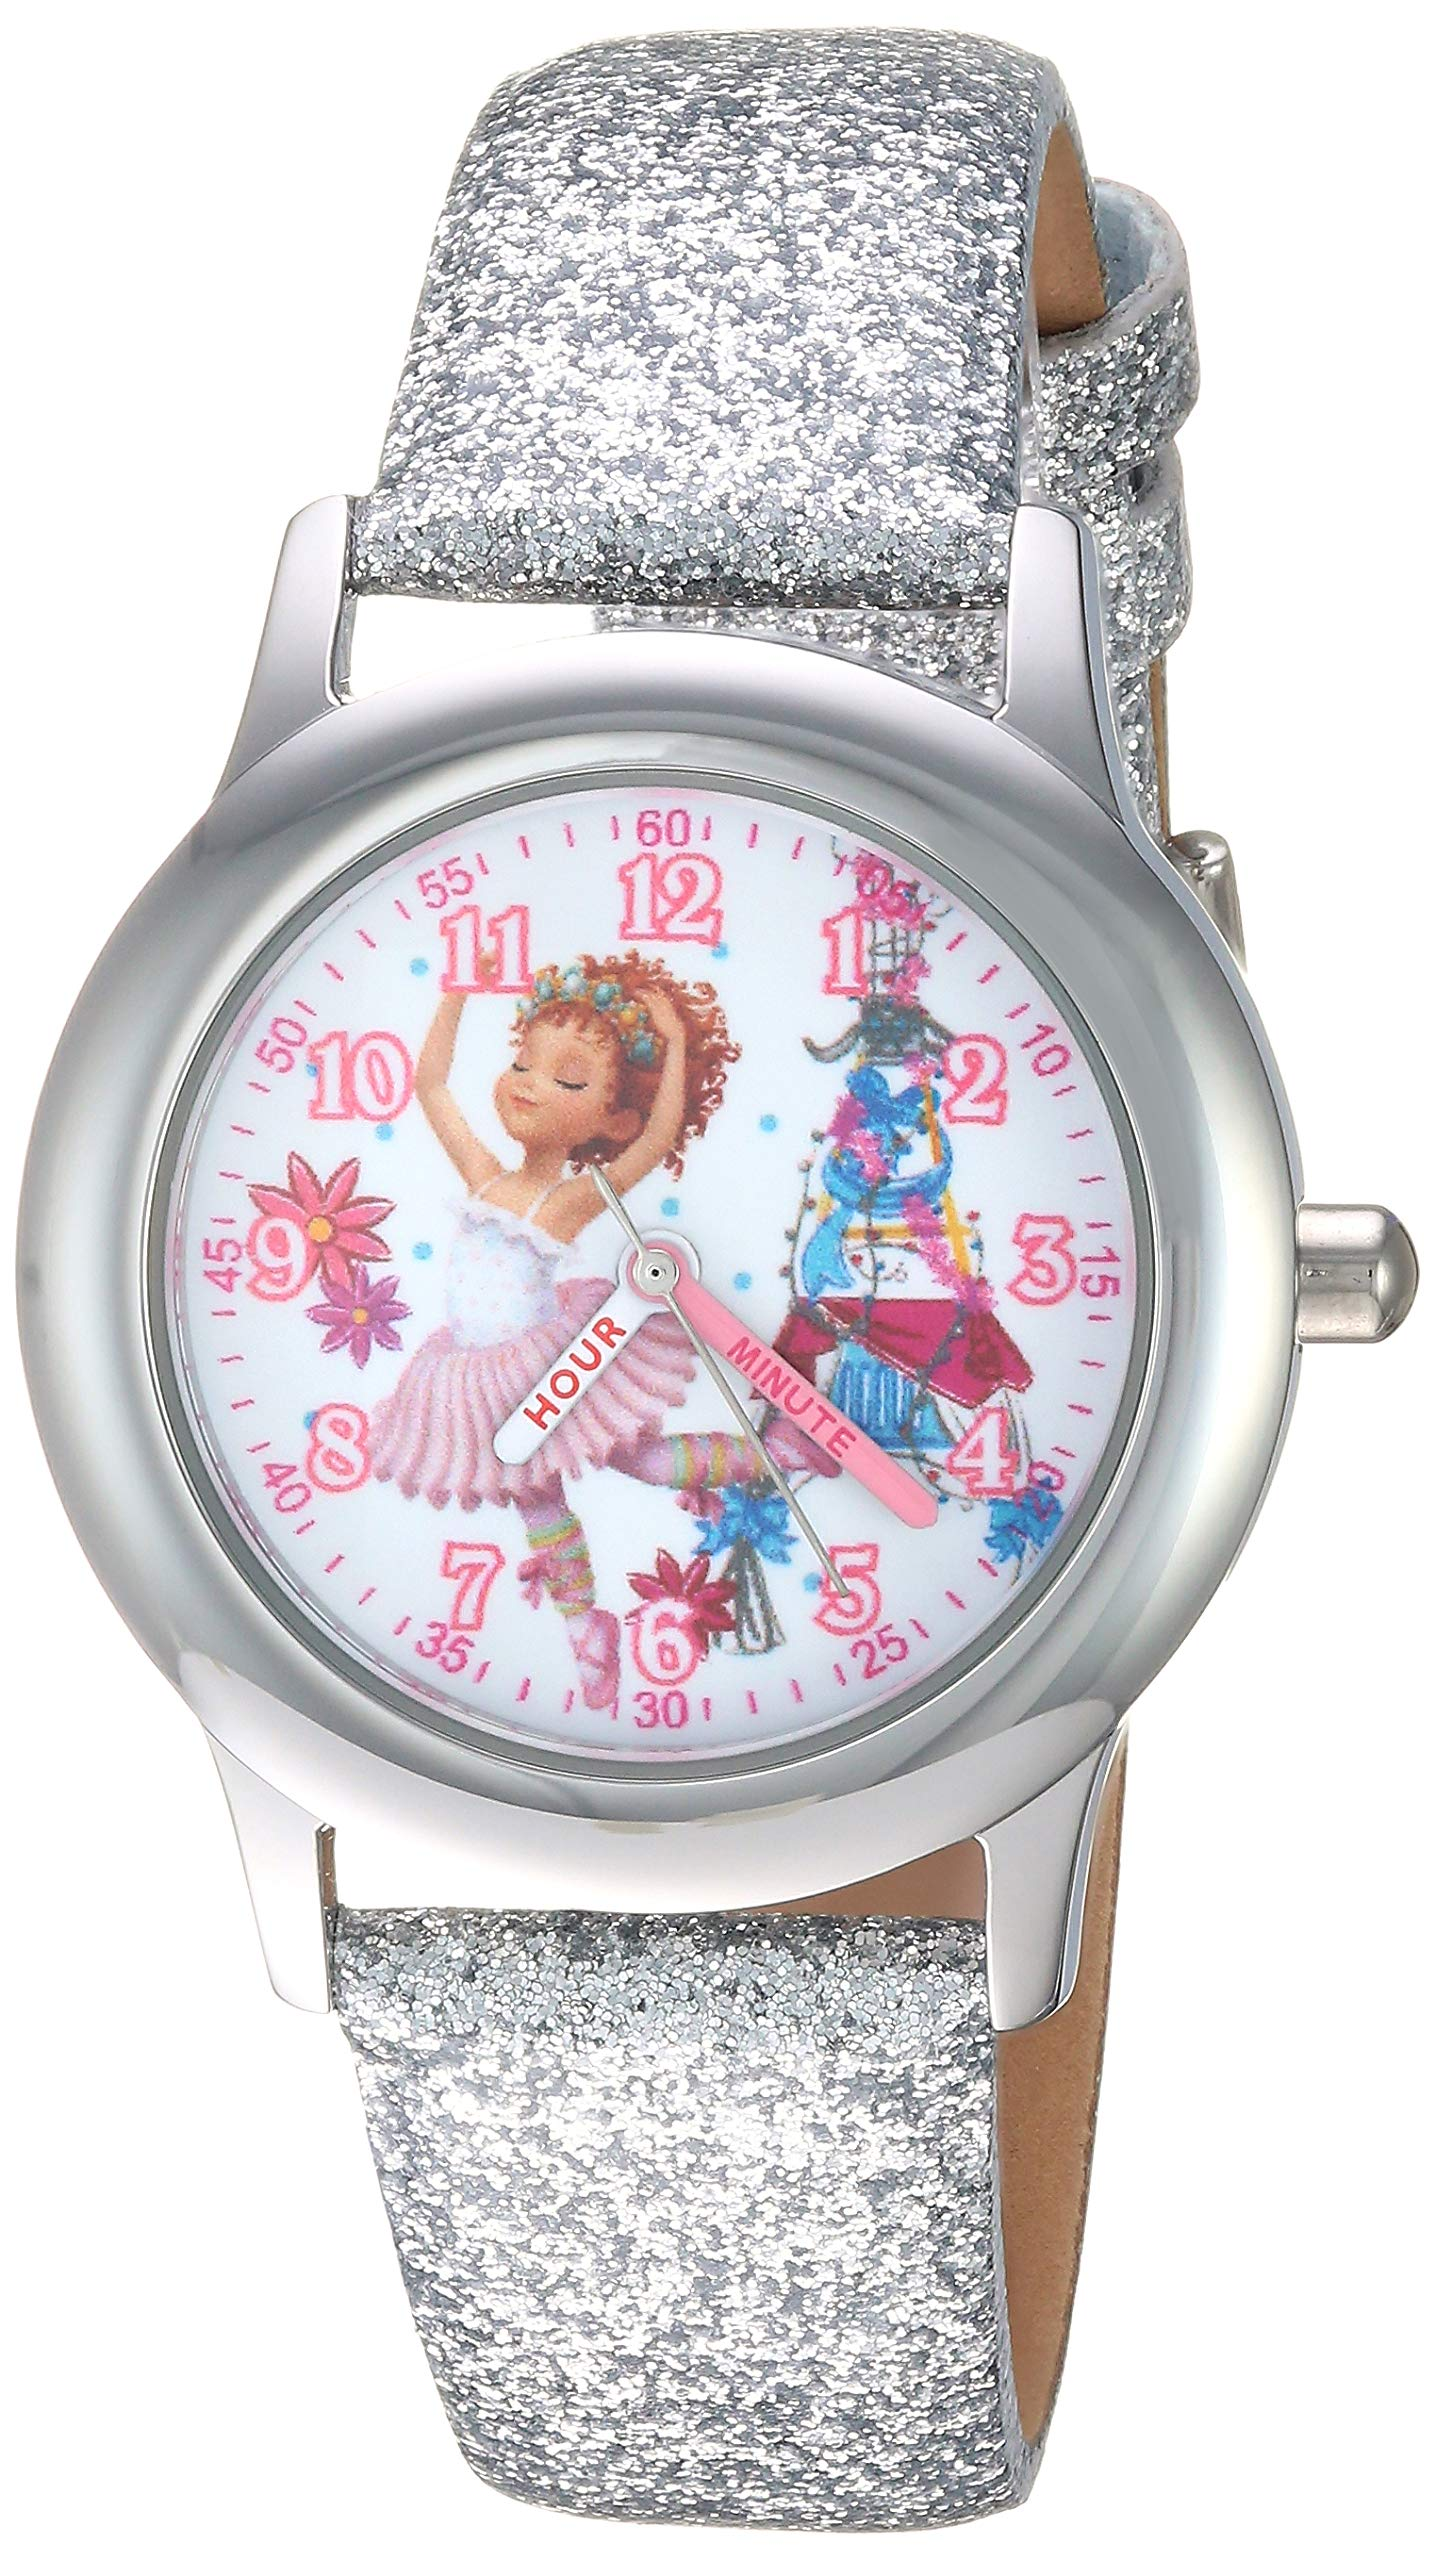 Disney Girls Fancy Nancy Stainless Steel Analog-Quartz Watch with Leather Strap, Silver, 13.5 (Model: WDS000599)